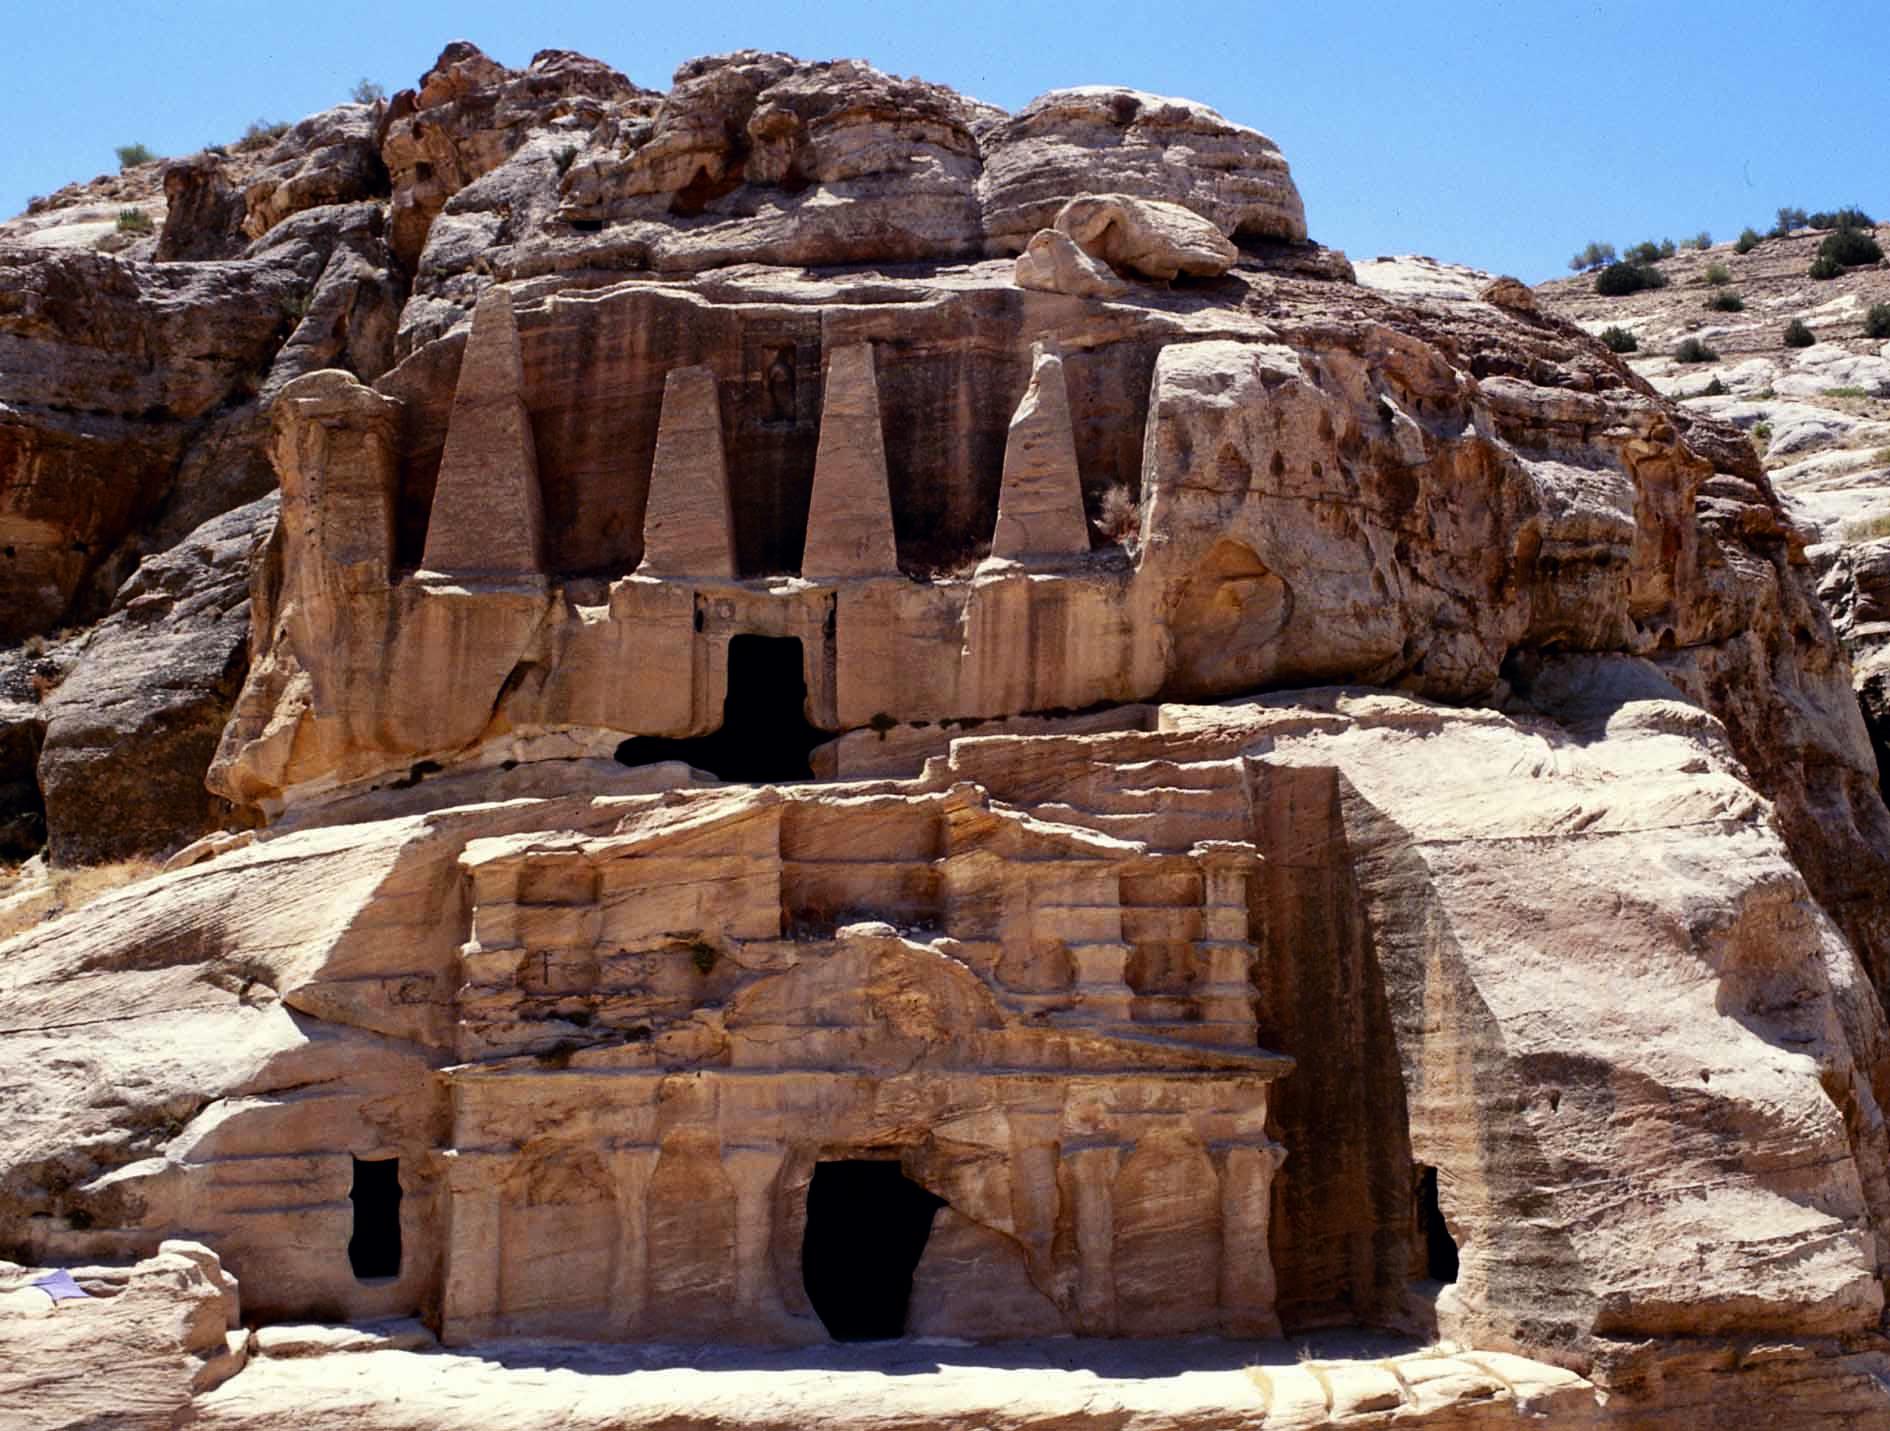 Obelisk Tomb in Petra